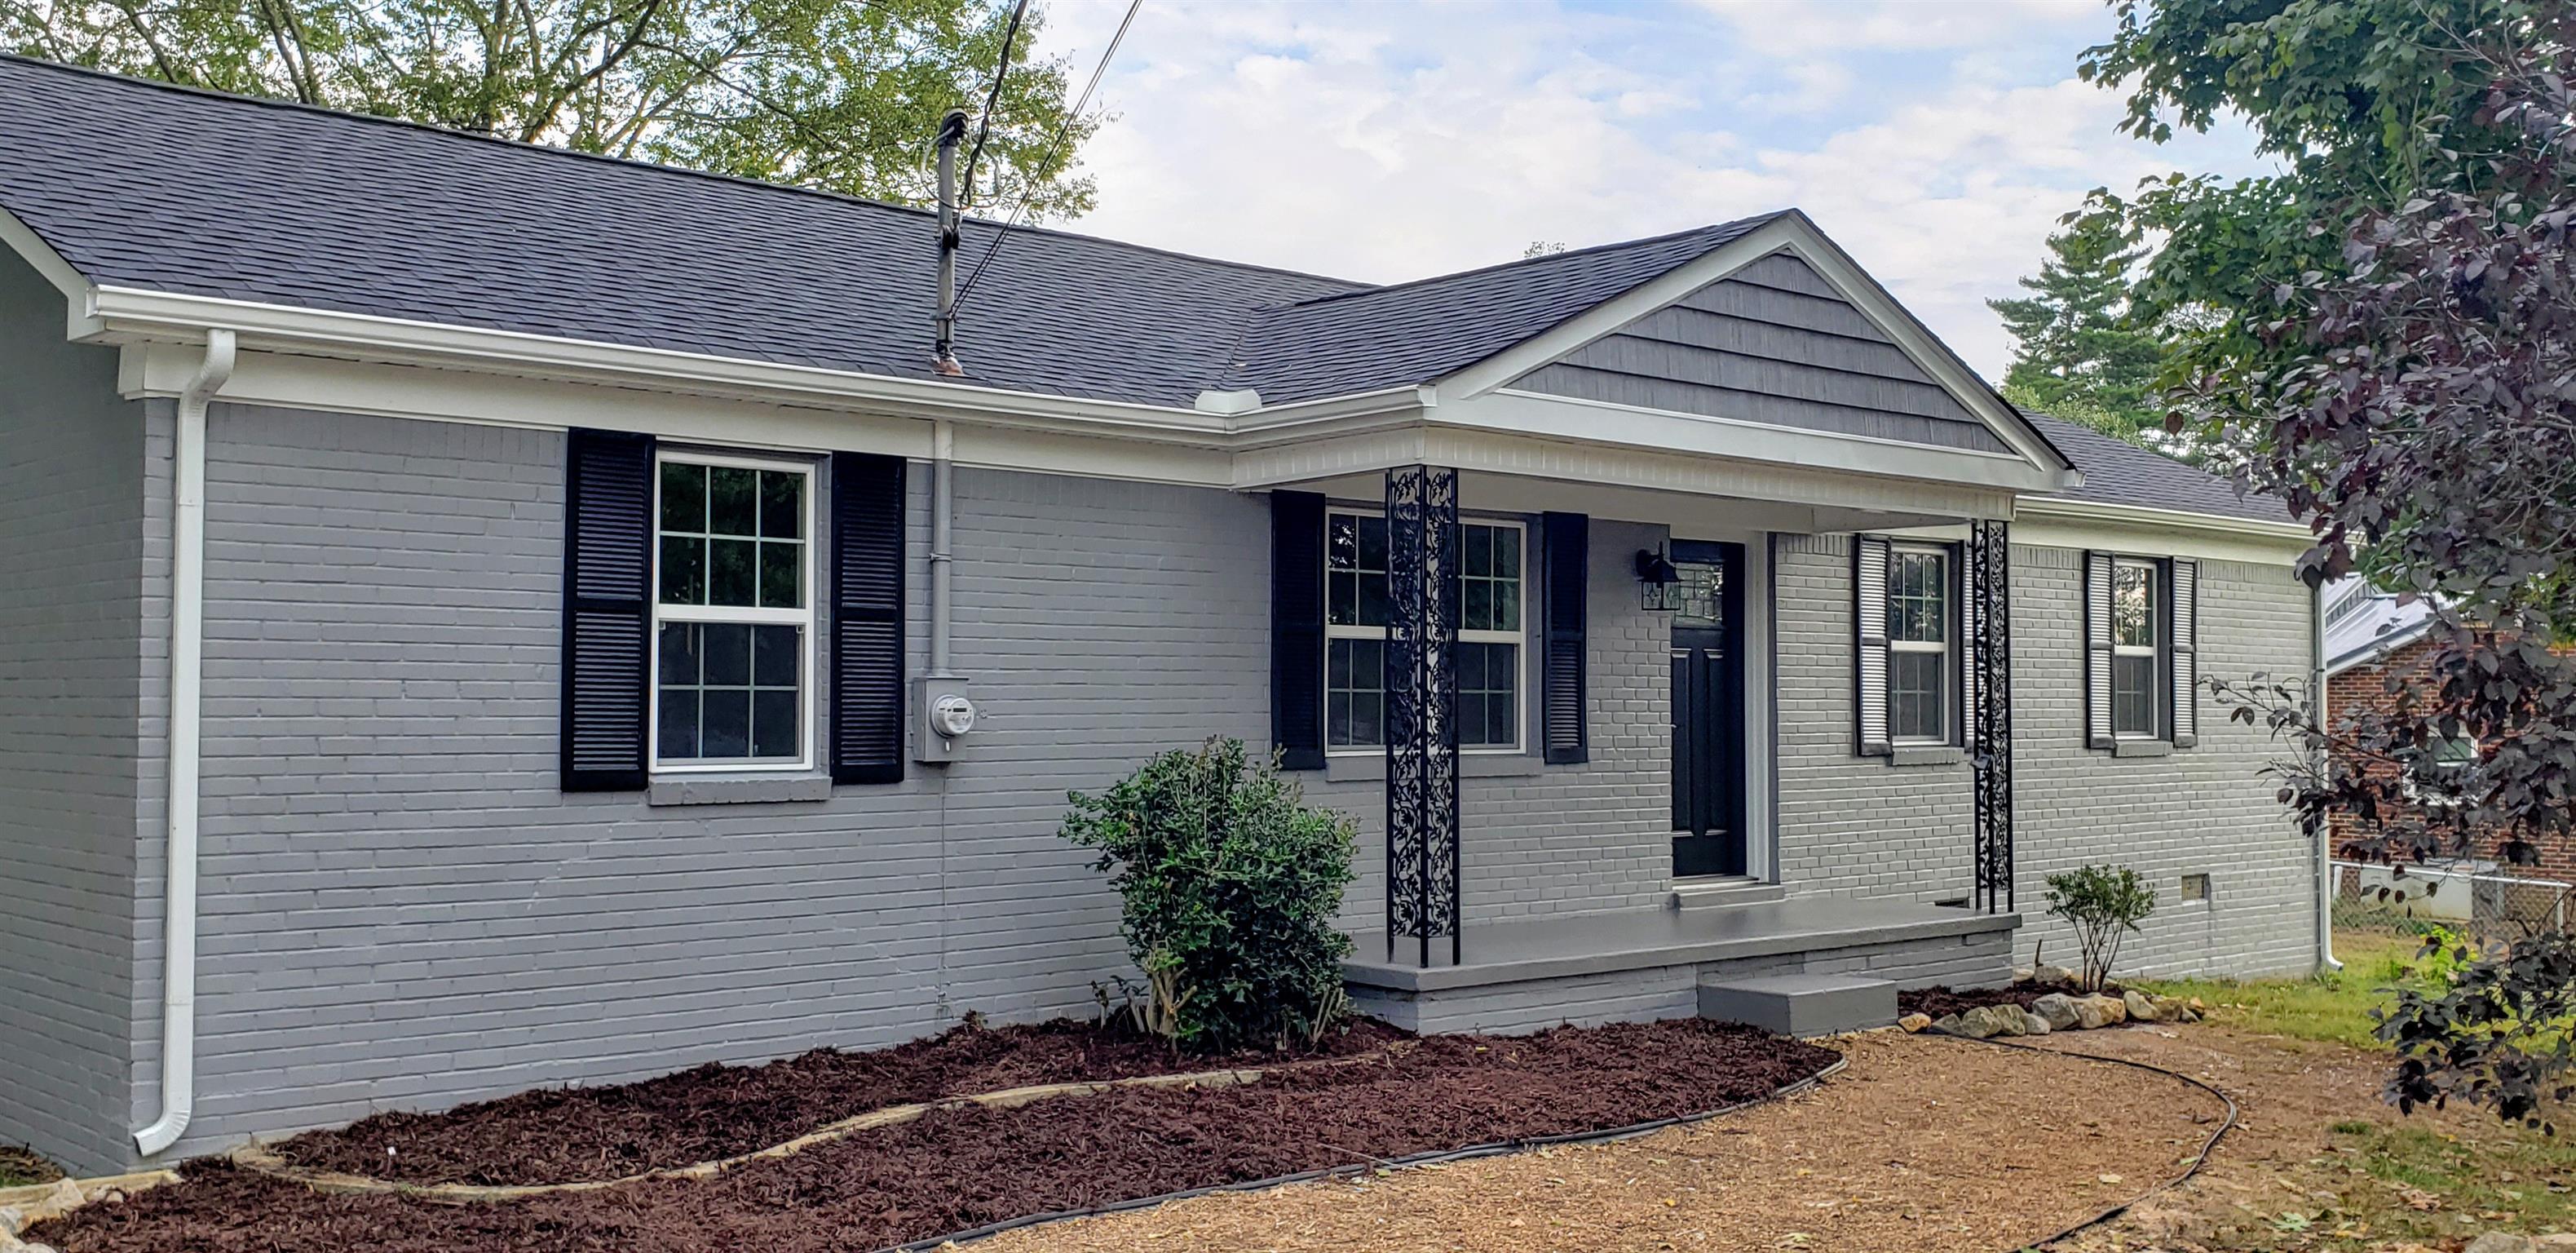 206 Redbud Ln, Unionville, TN 37180 - Unionville, TN real estate listing